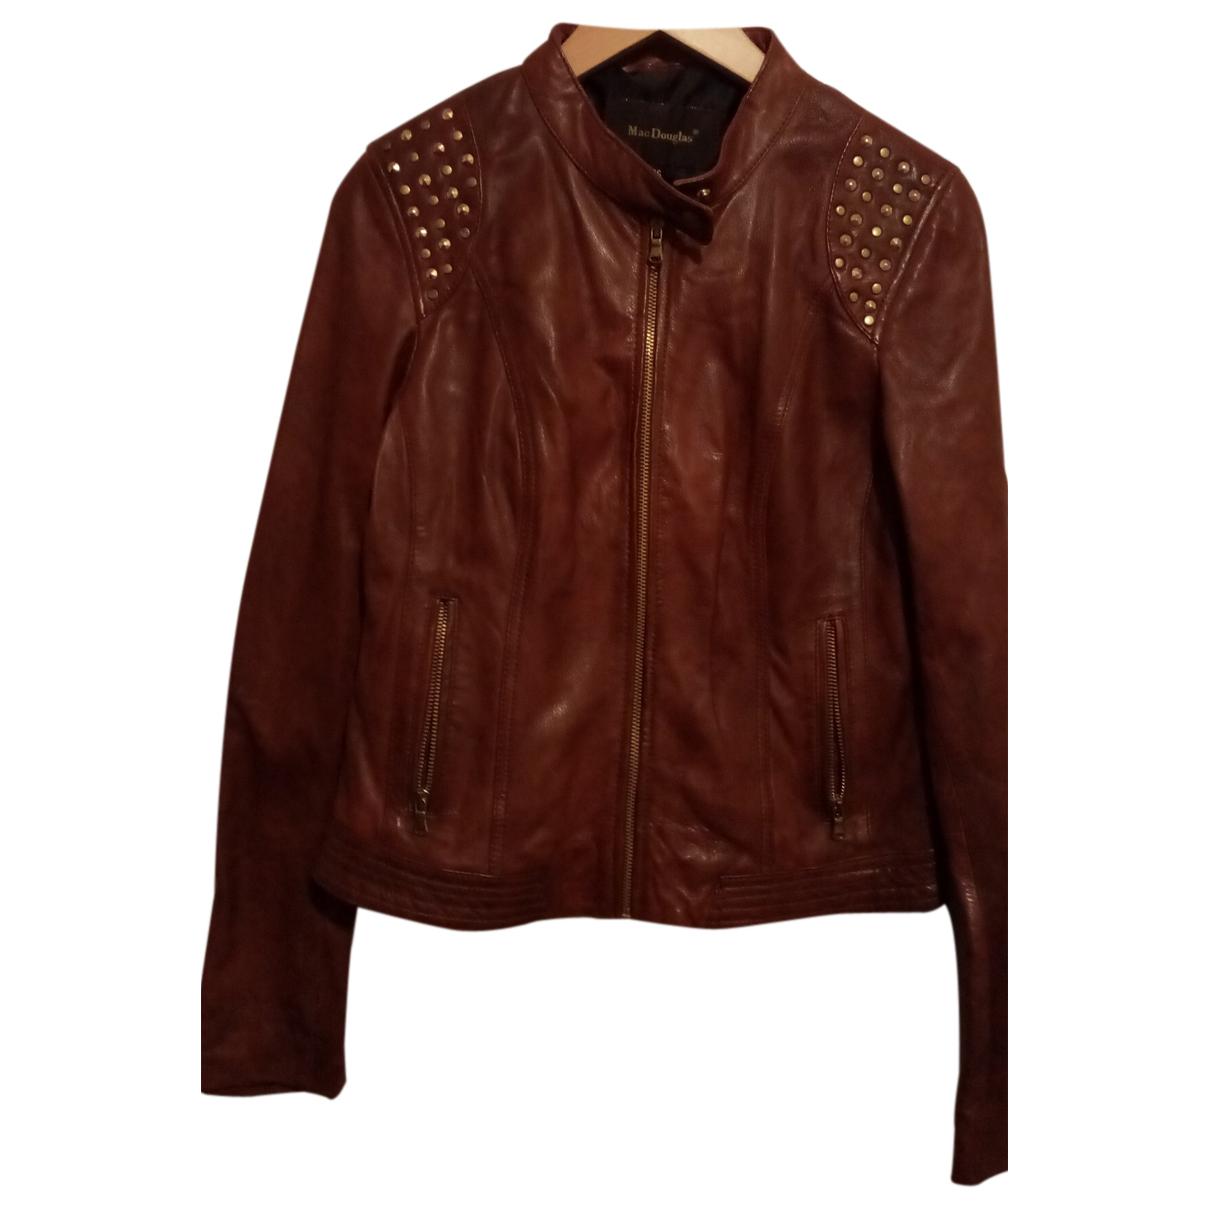 Mac Douglas N Burgundy Leather Leather jacket for Women 36 FR